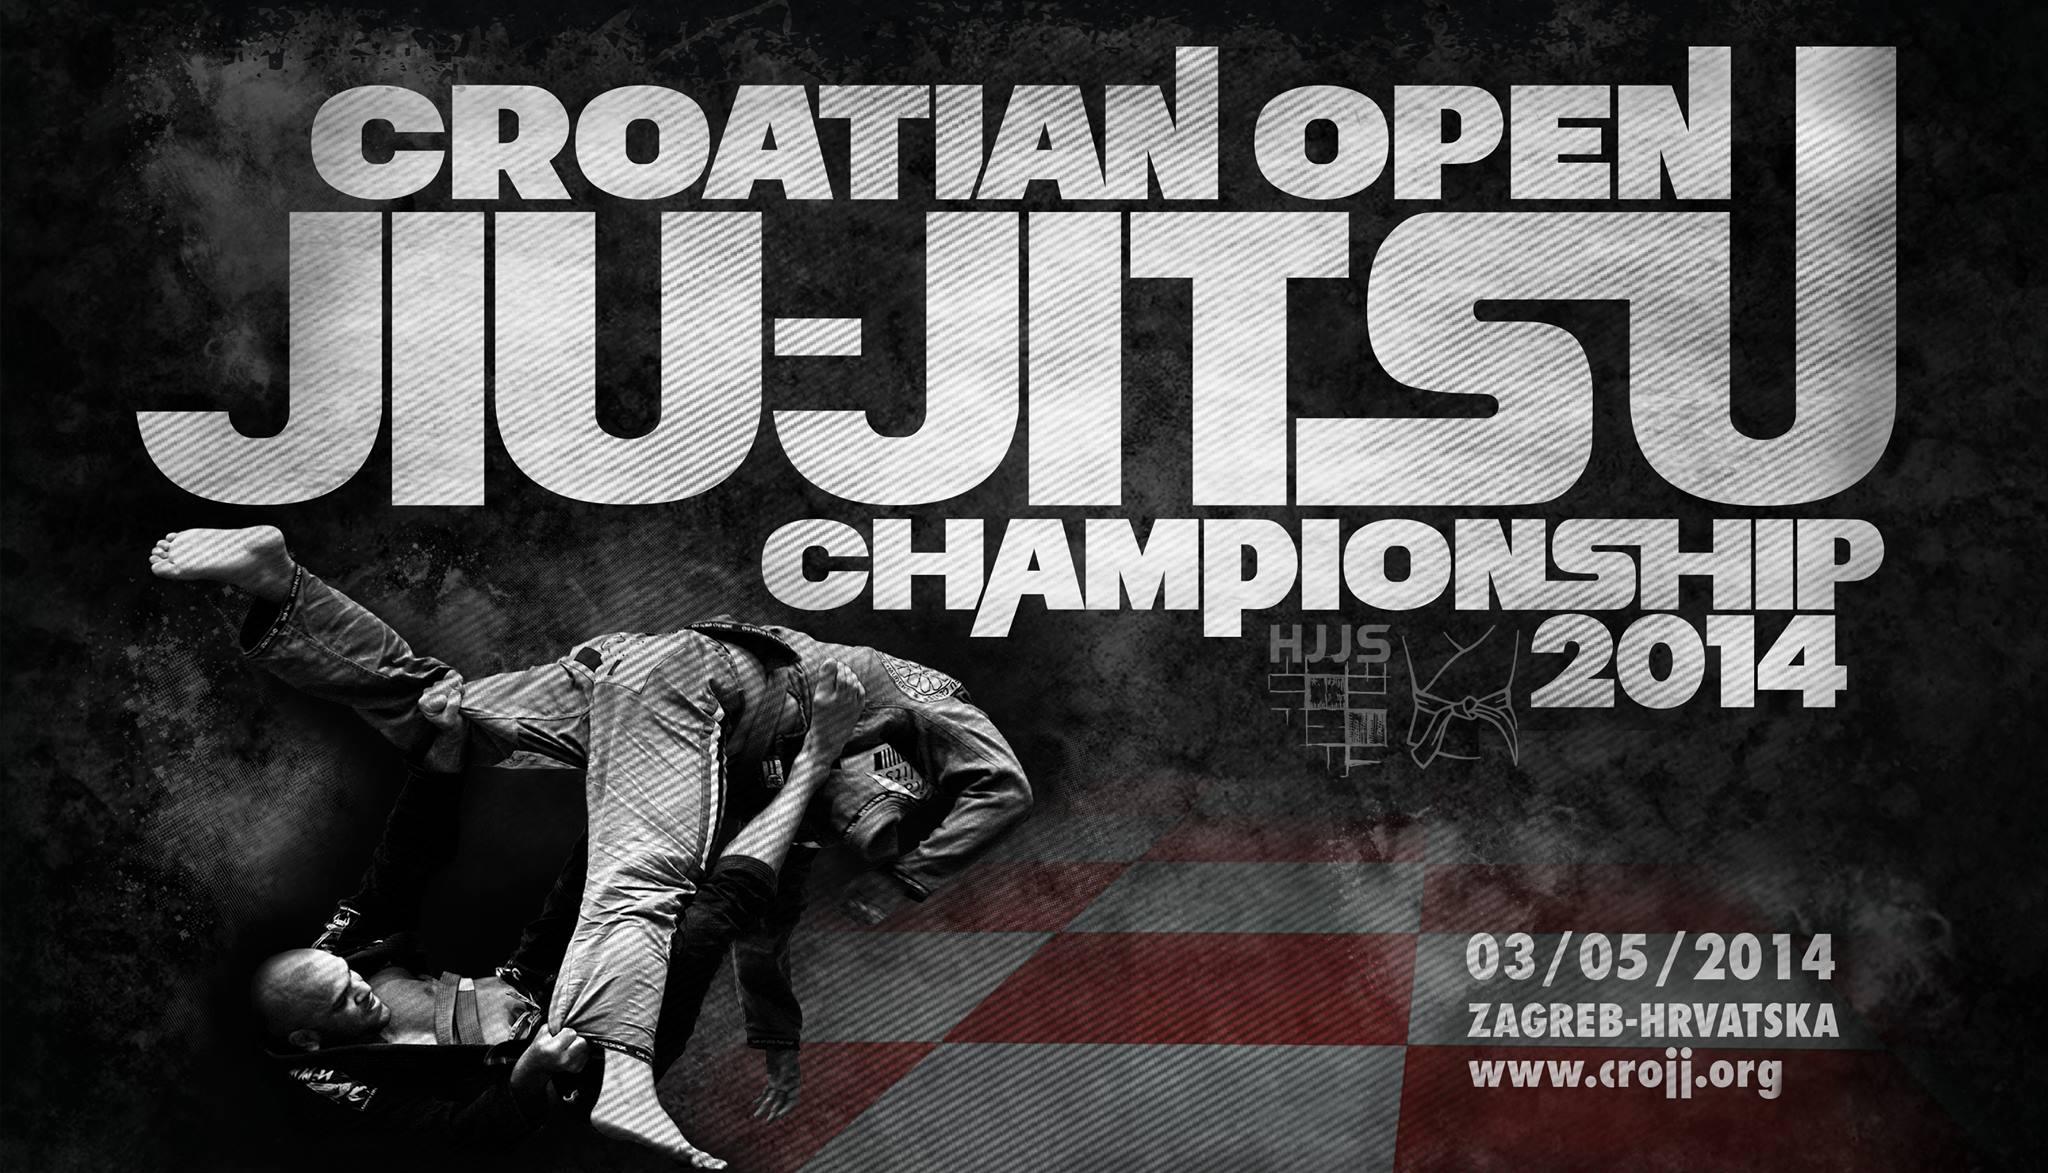 Croatian Open BJJ Championship, Zagreb, Croatia 3.5.2014